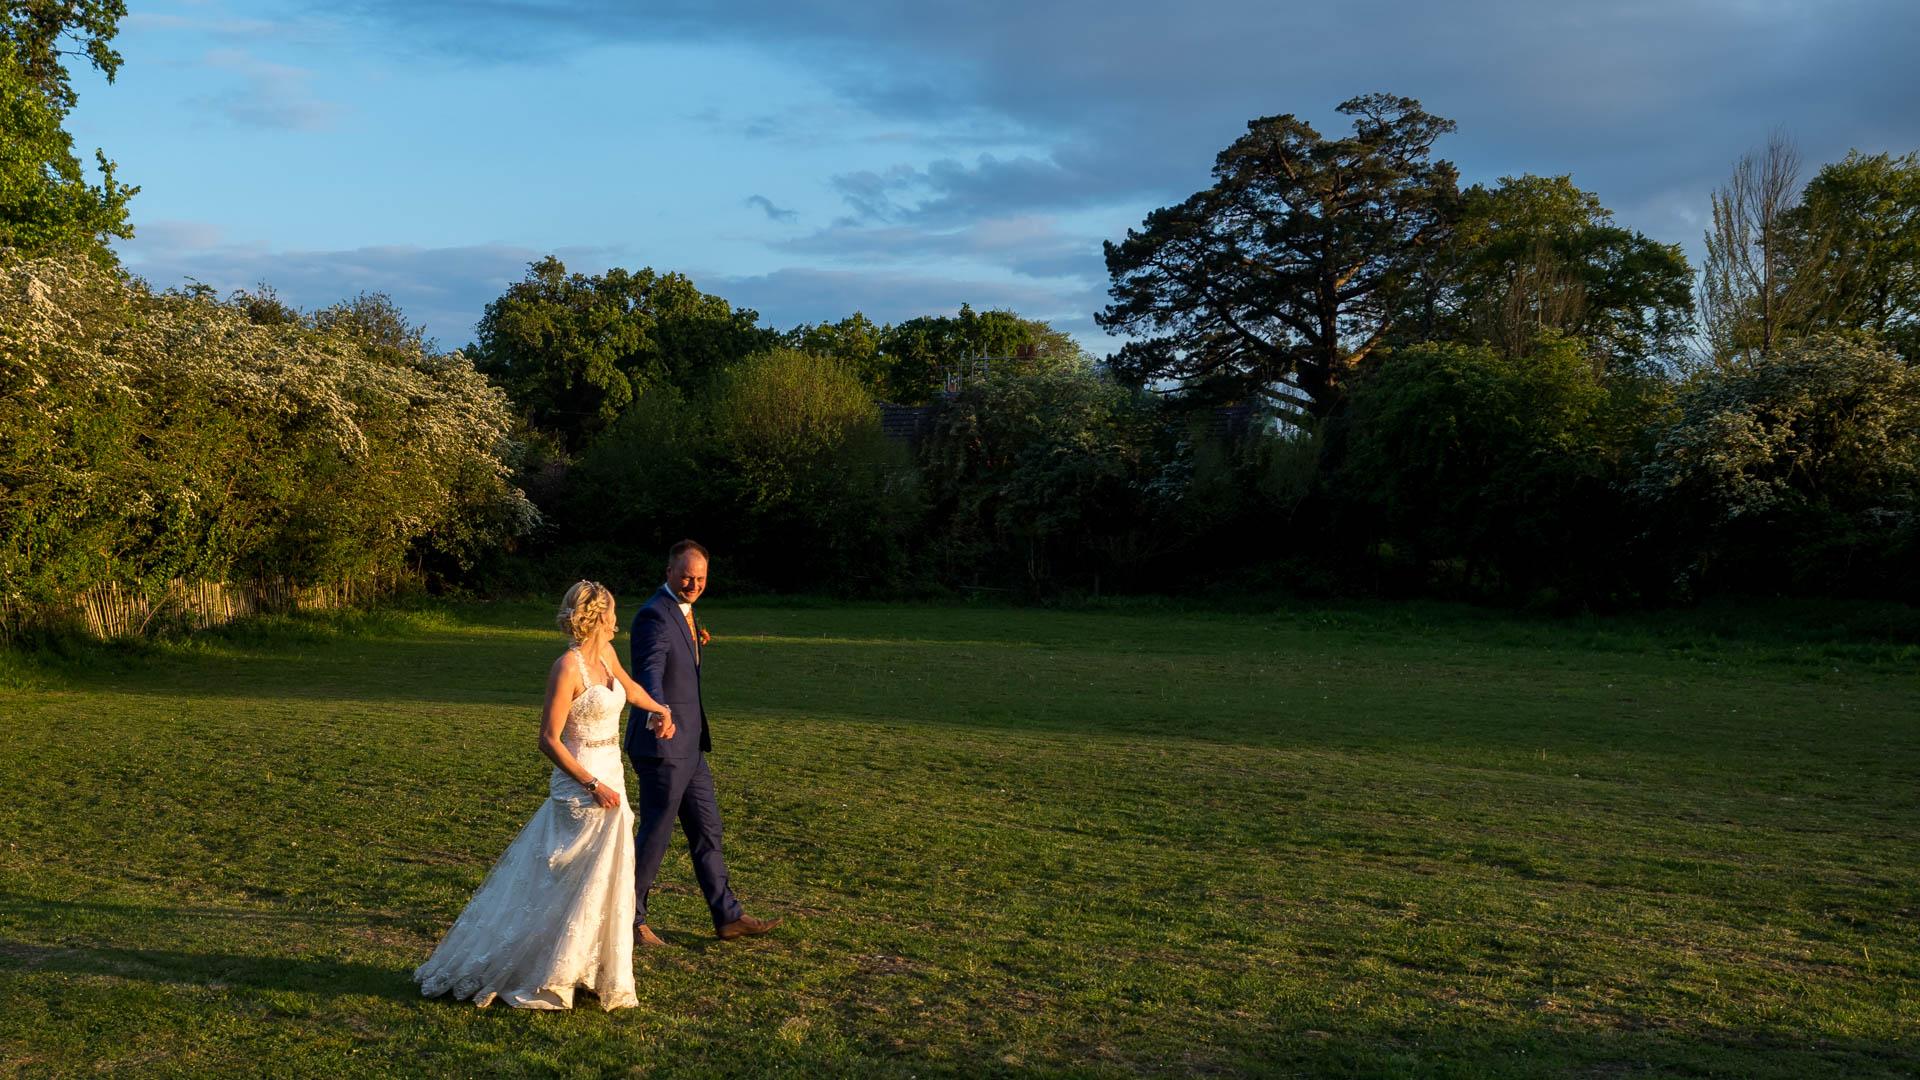 Bride and groom walk across field in spring evening sunshine